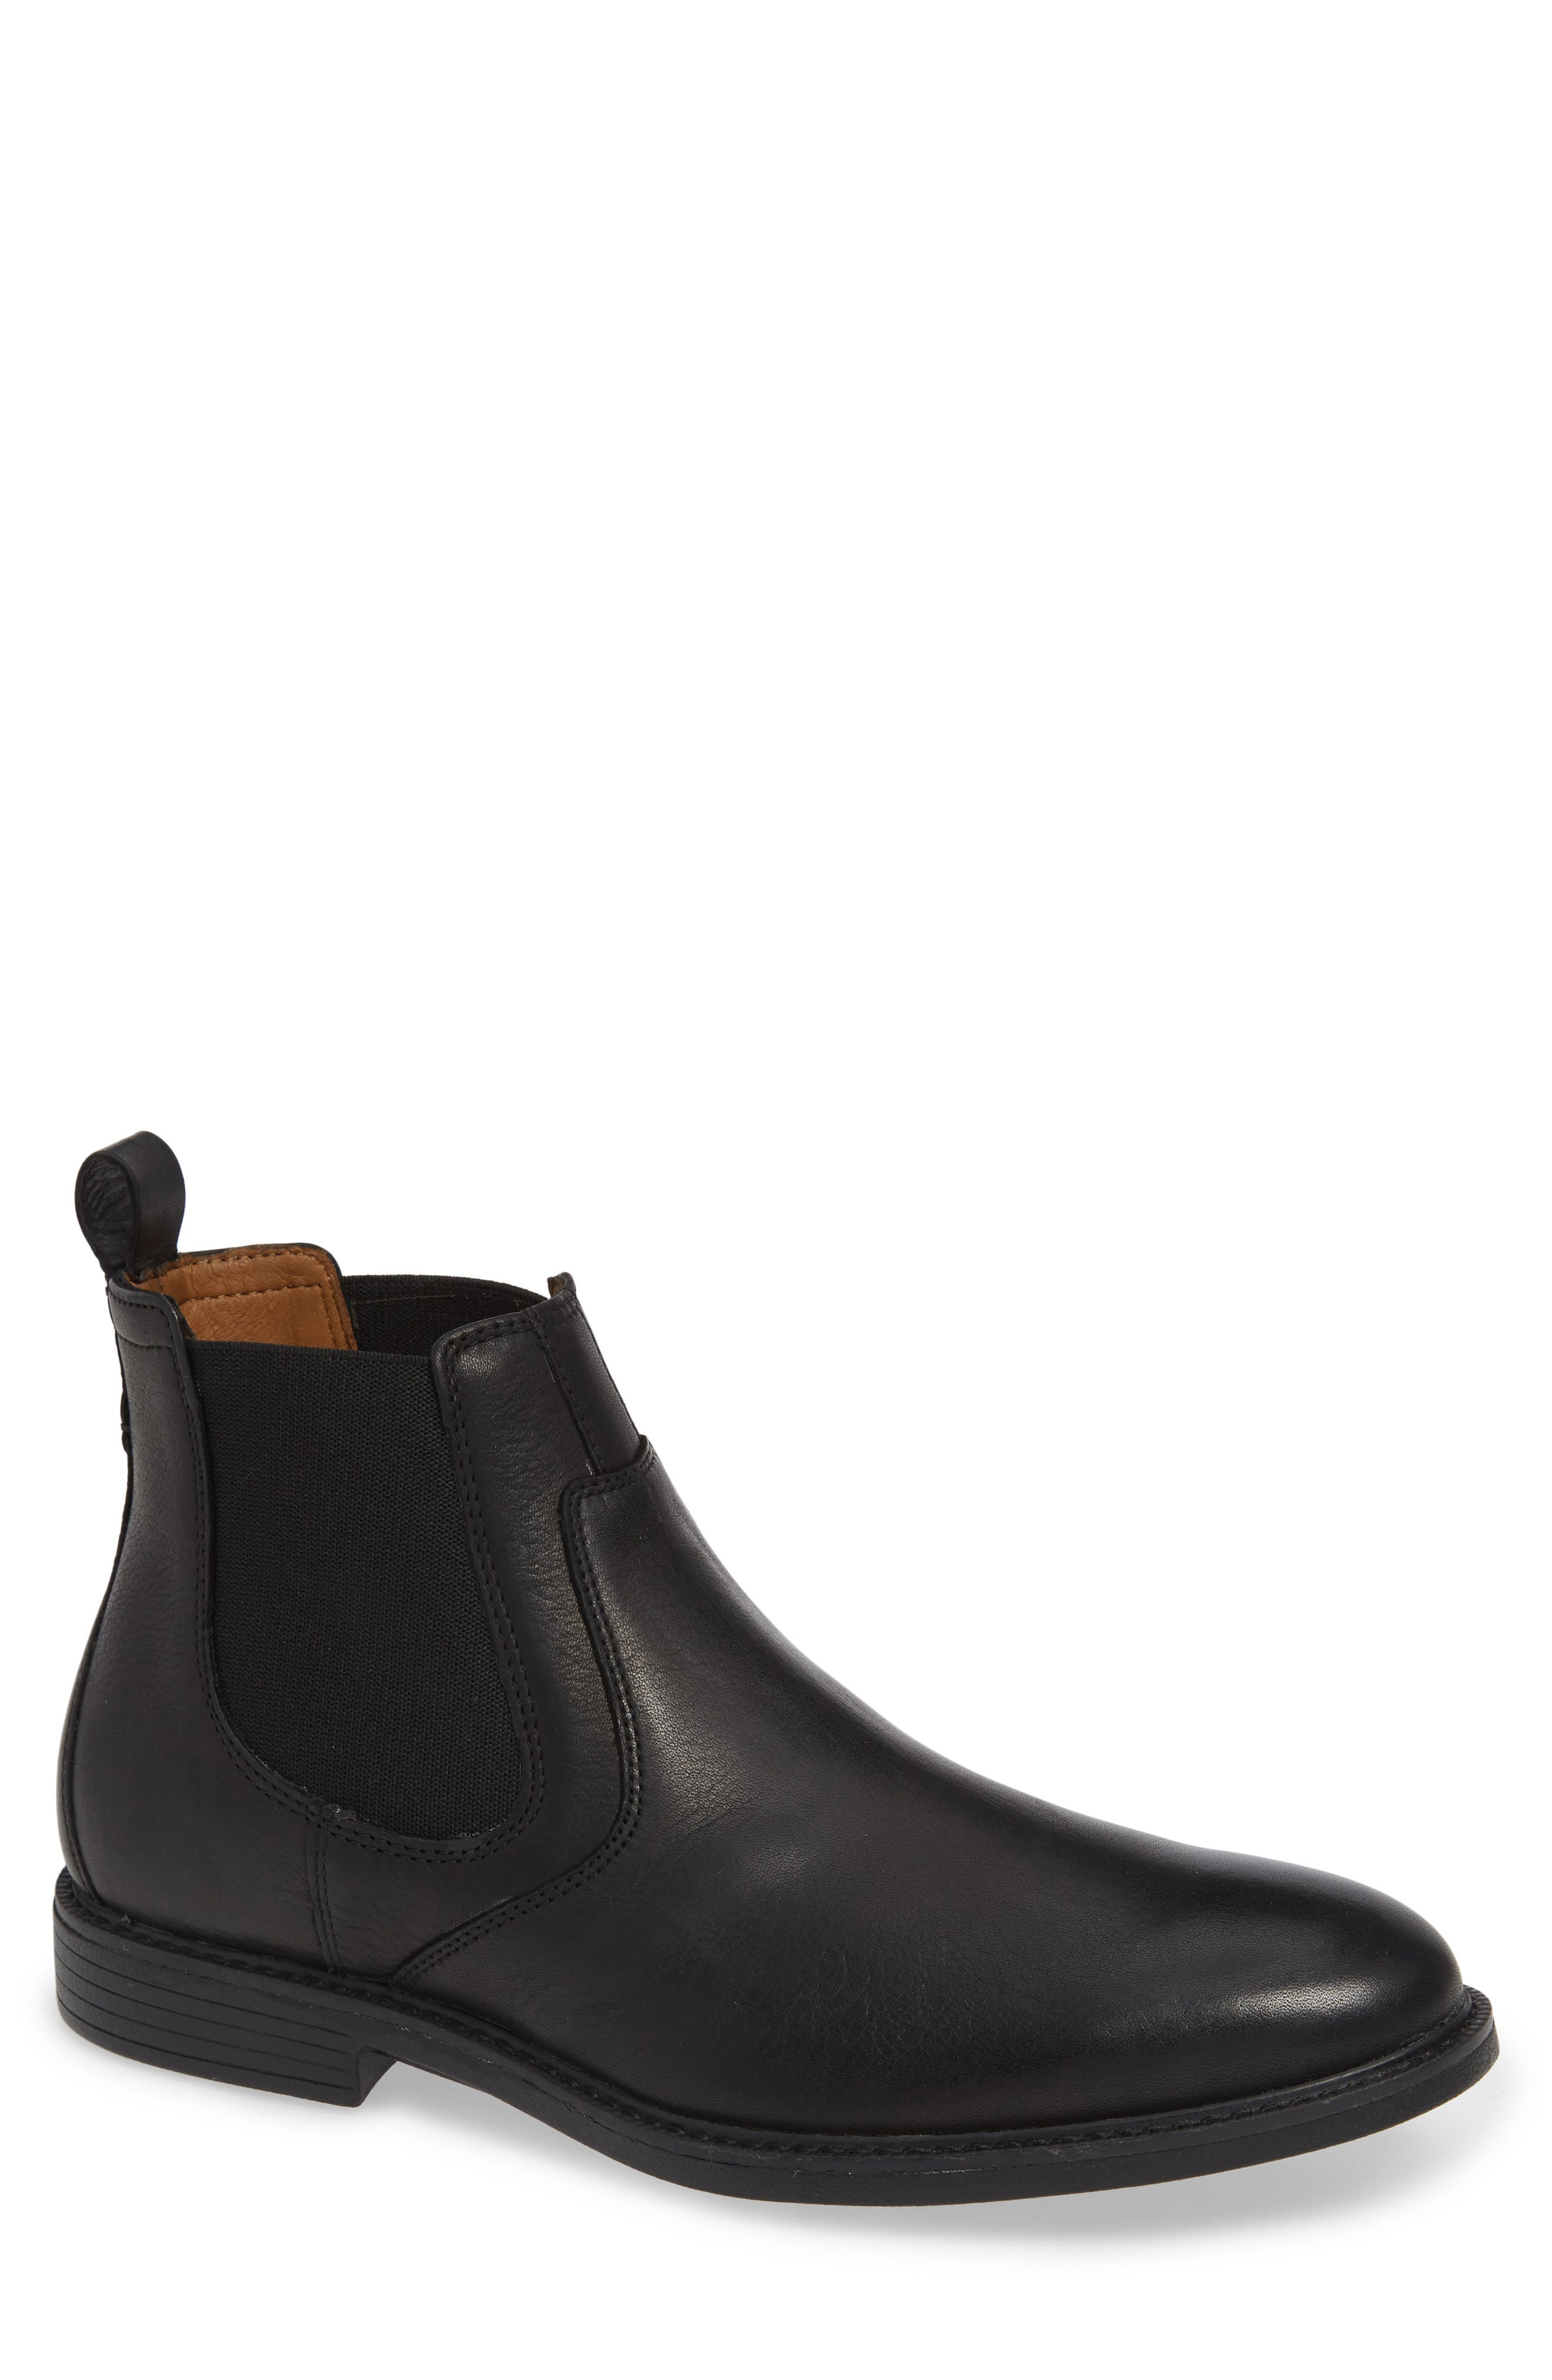 Hollis Waterproof Chelsea Boot,                         Main,                         color, BLACK LEATHER